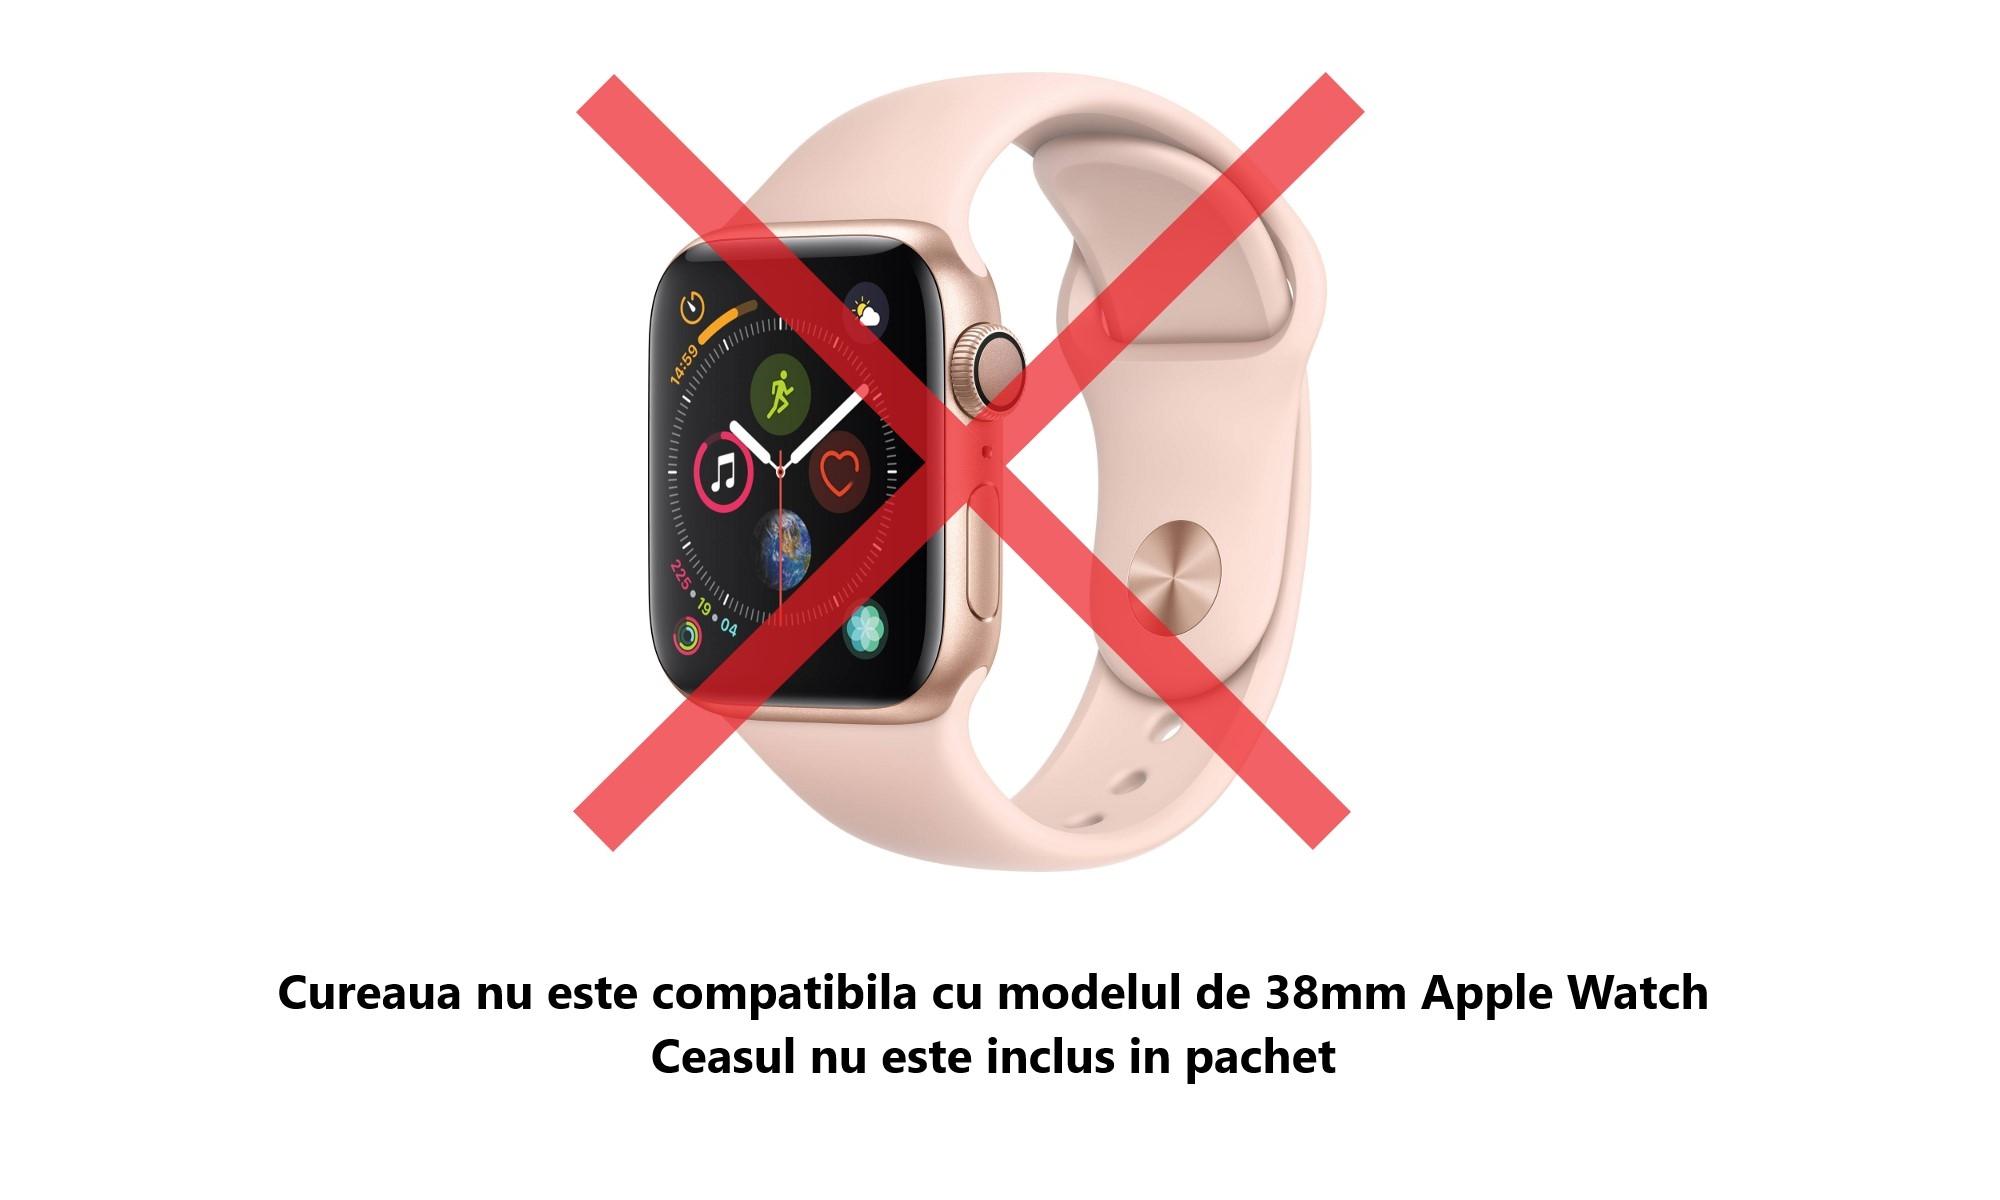 Curea Apple Watch 42mm, Soft Silicone compatibila cu Apple Watch Seria 3, Seria 2, Seria 1, Sport Edition, masura M/L (Negru/Verde neon)